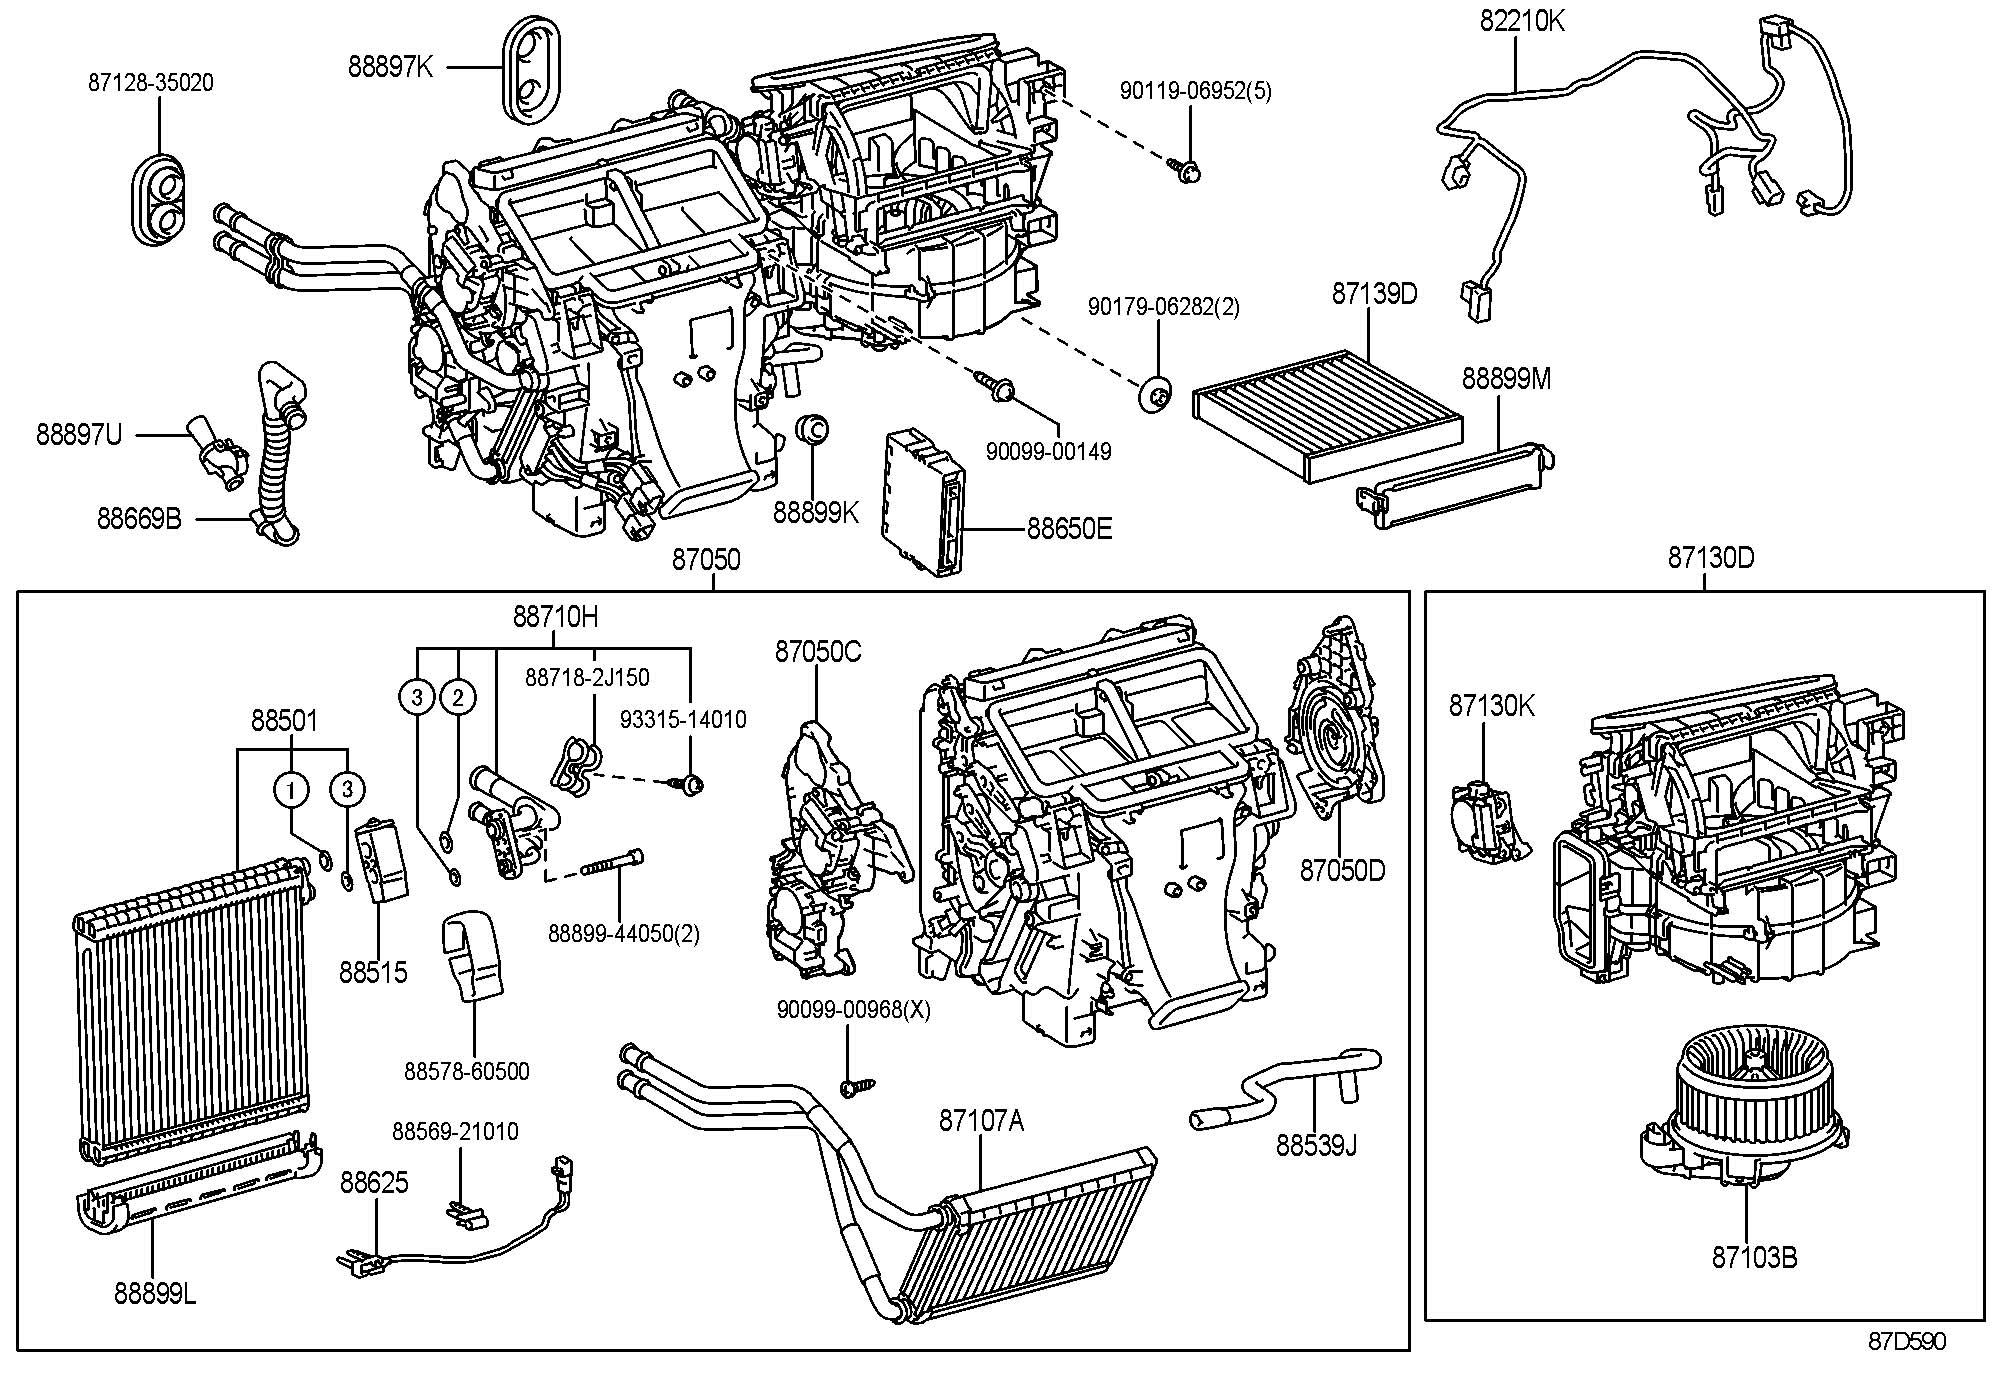 Lexus Gx460 Dashboard | Wiring Diagram Database